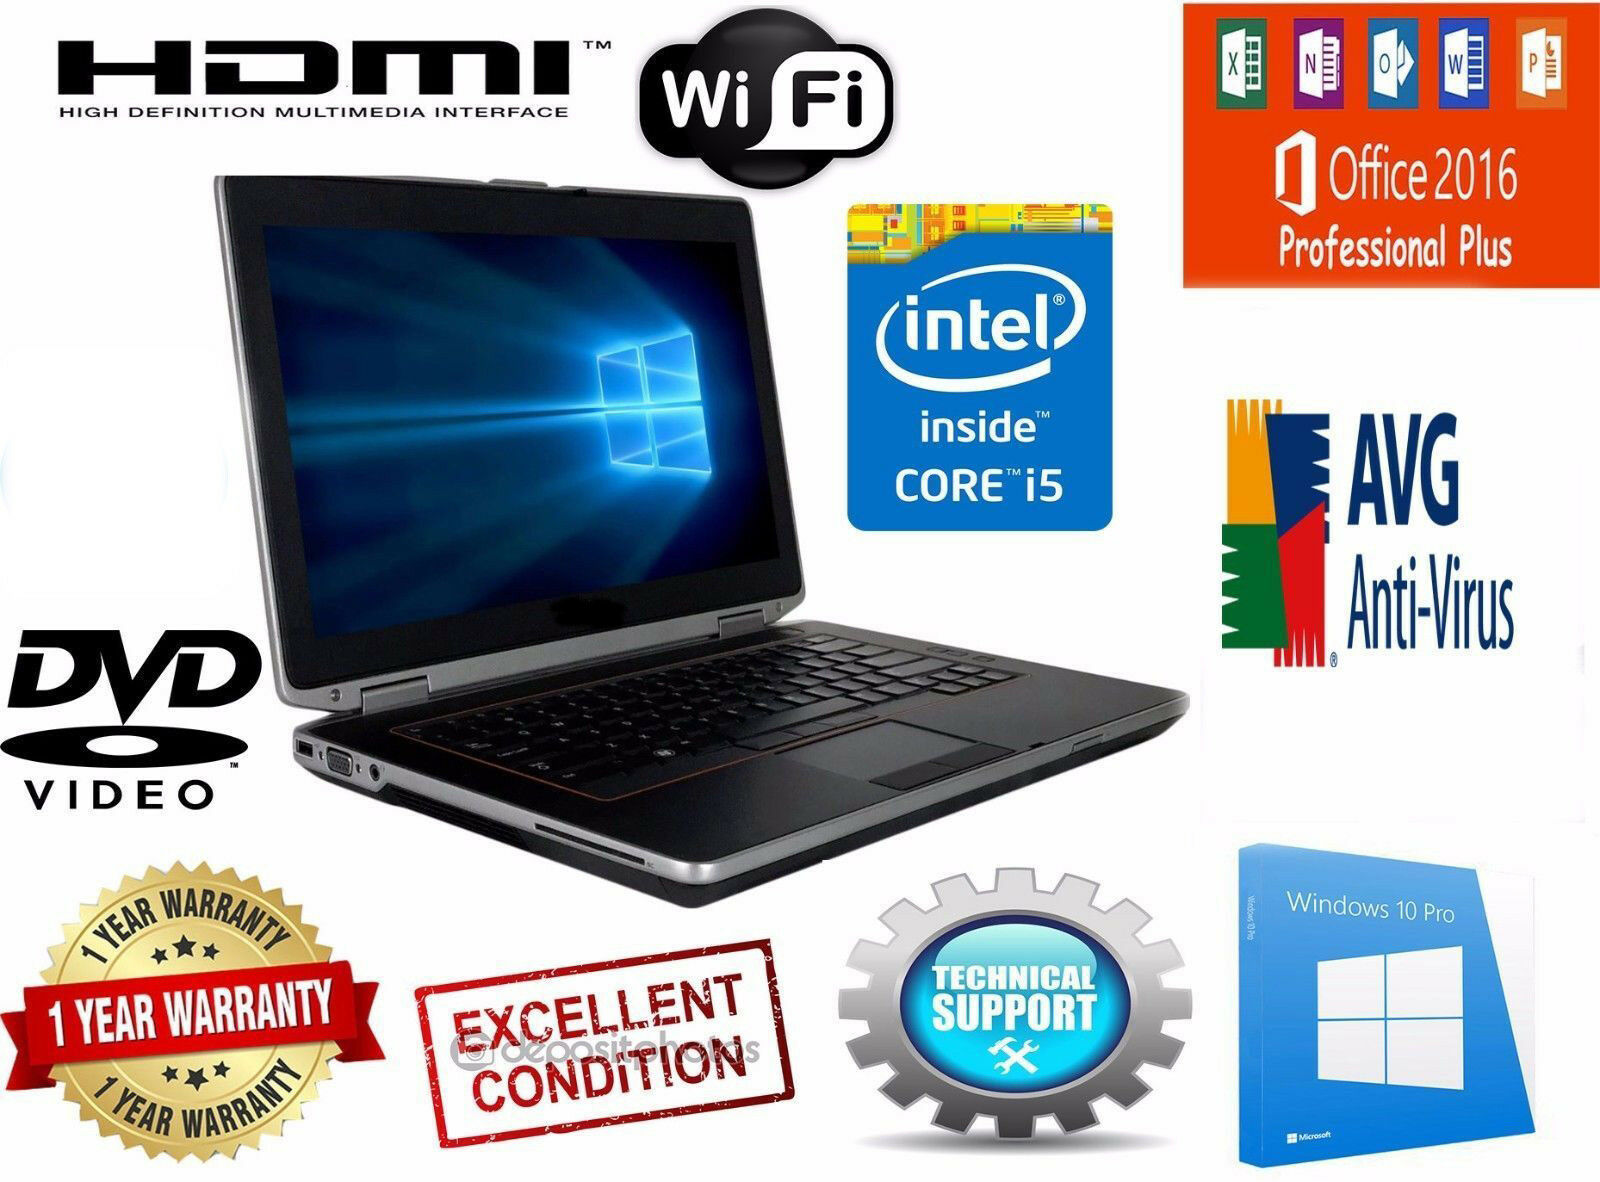 DELL LATITUDE Laptop Computer PC CORE I5 Windows 8GB OFFICE WiFi DVD NOTEBOOK HD